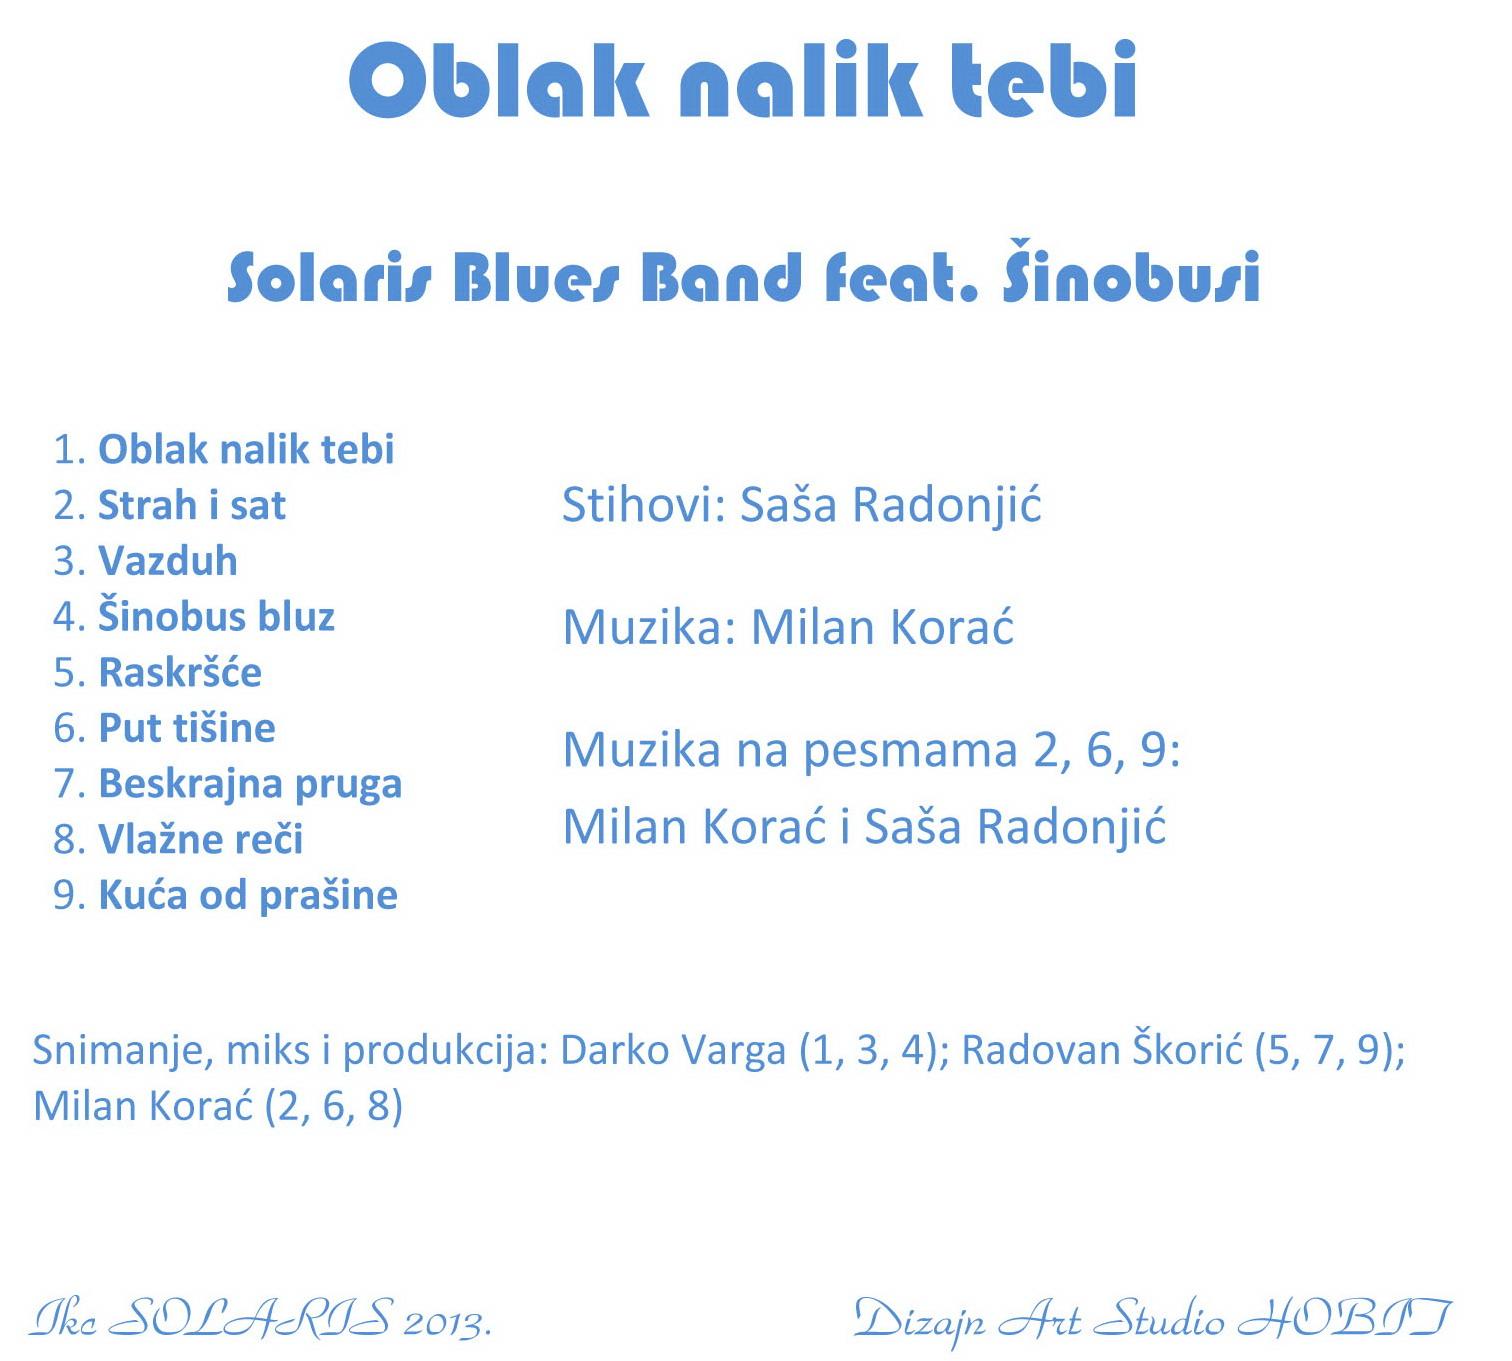 Solaris Blues Band feat. Šinobusi - Oblak nalik tebi (zadnja)